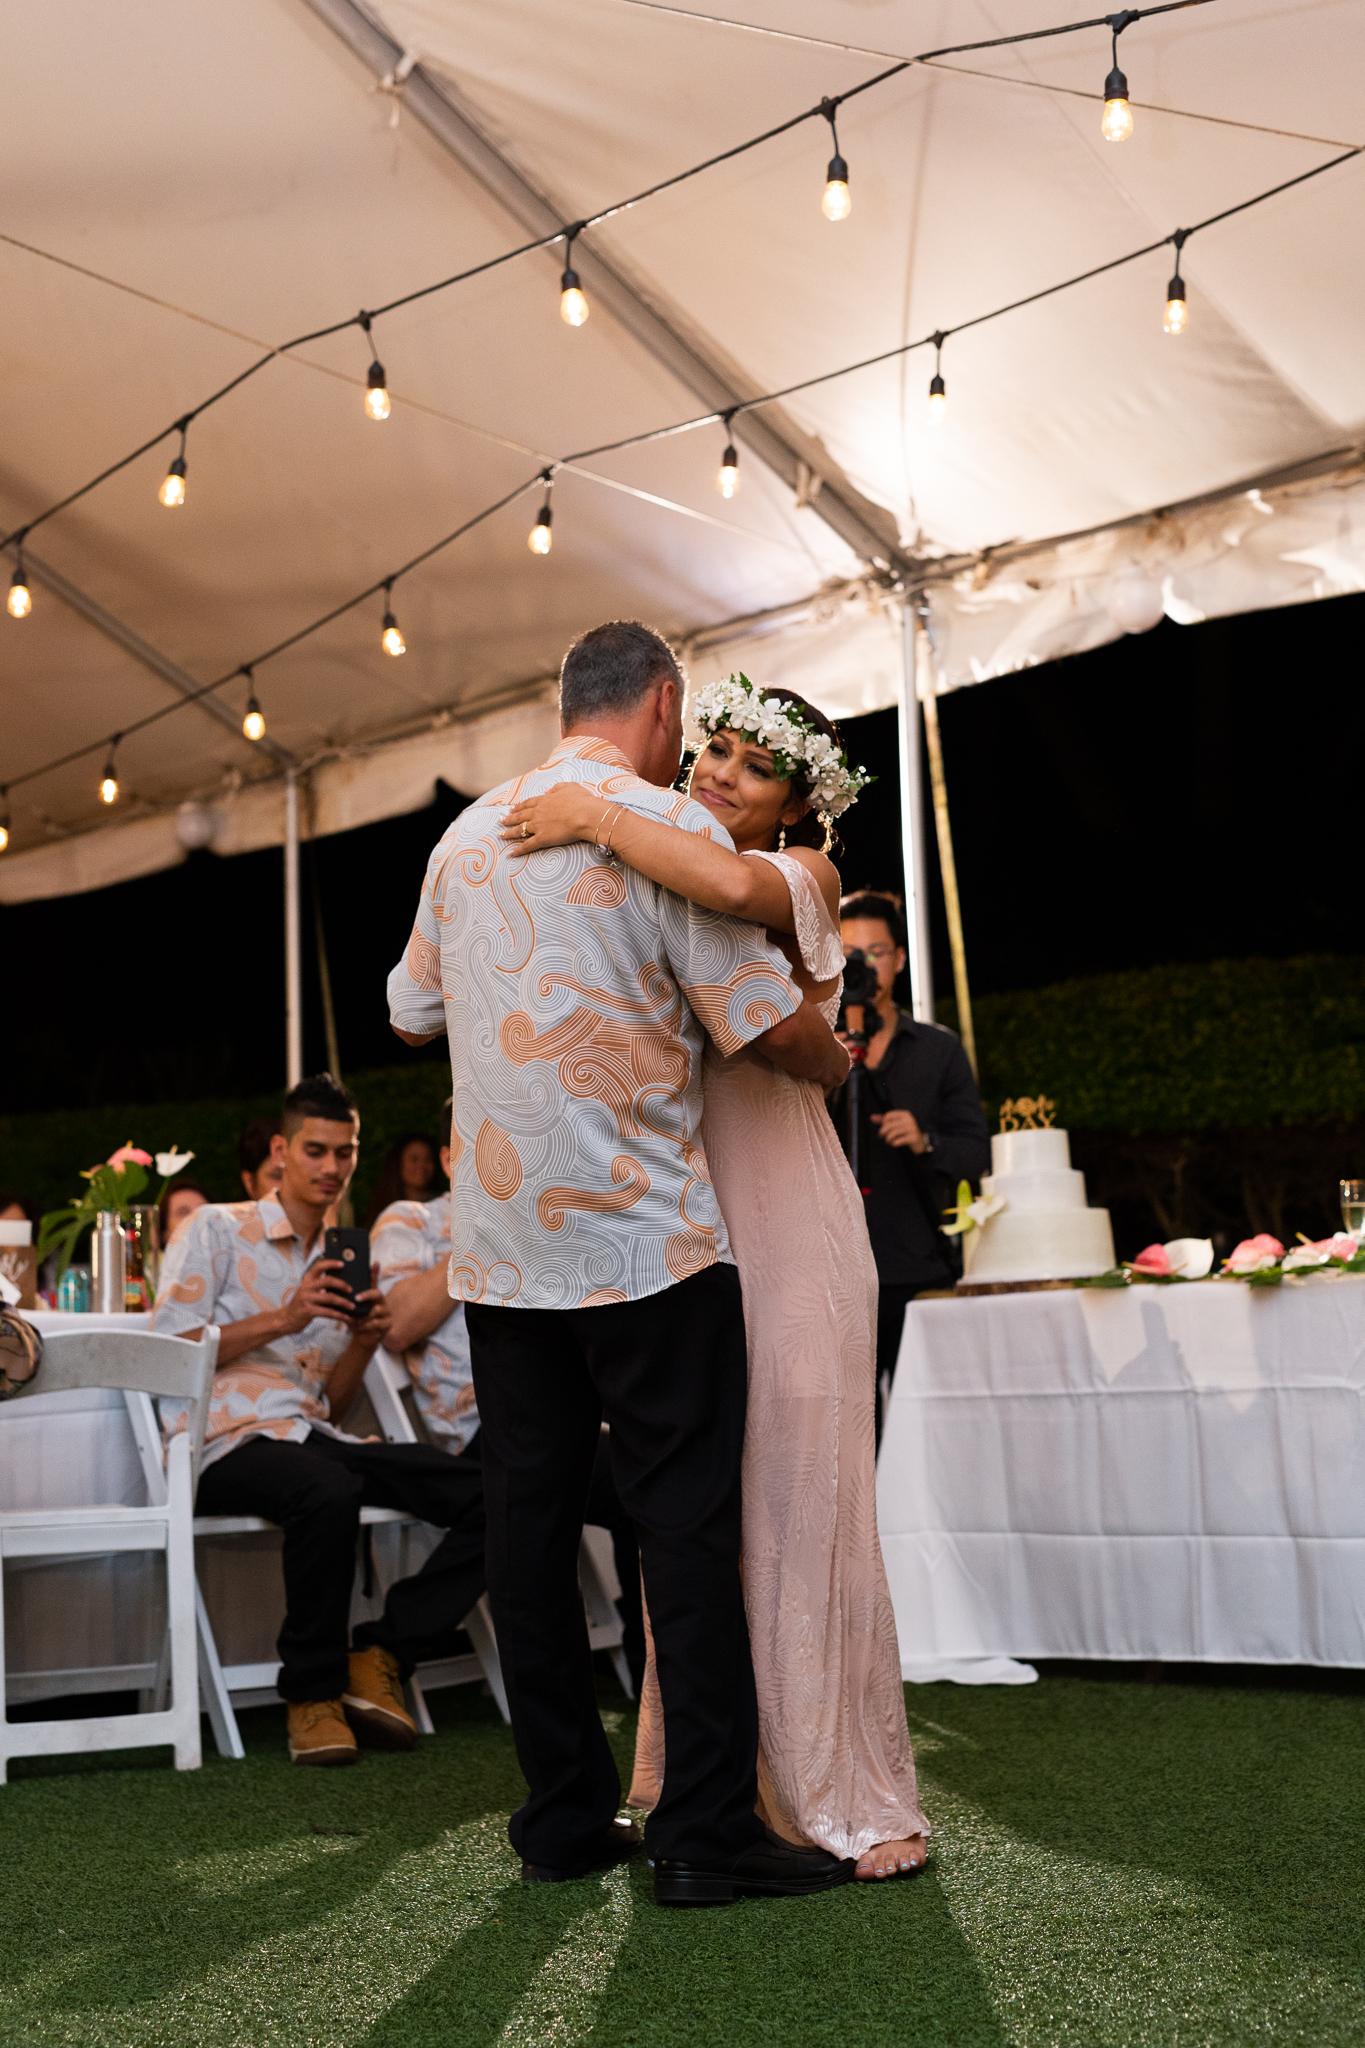 Kualoa_Ranch_Wedding_Photographer_Tone_Hawaii-48.jpg